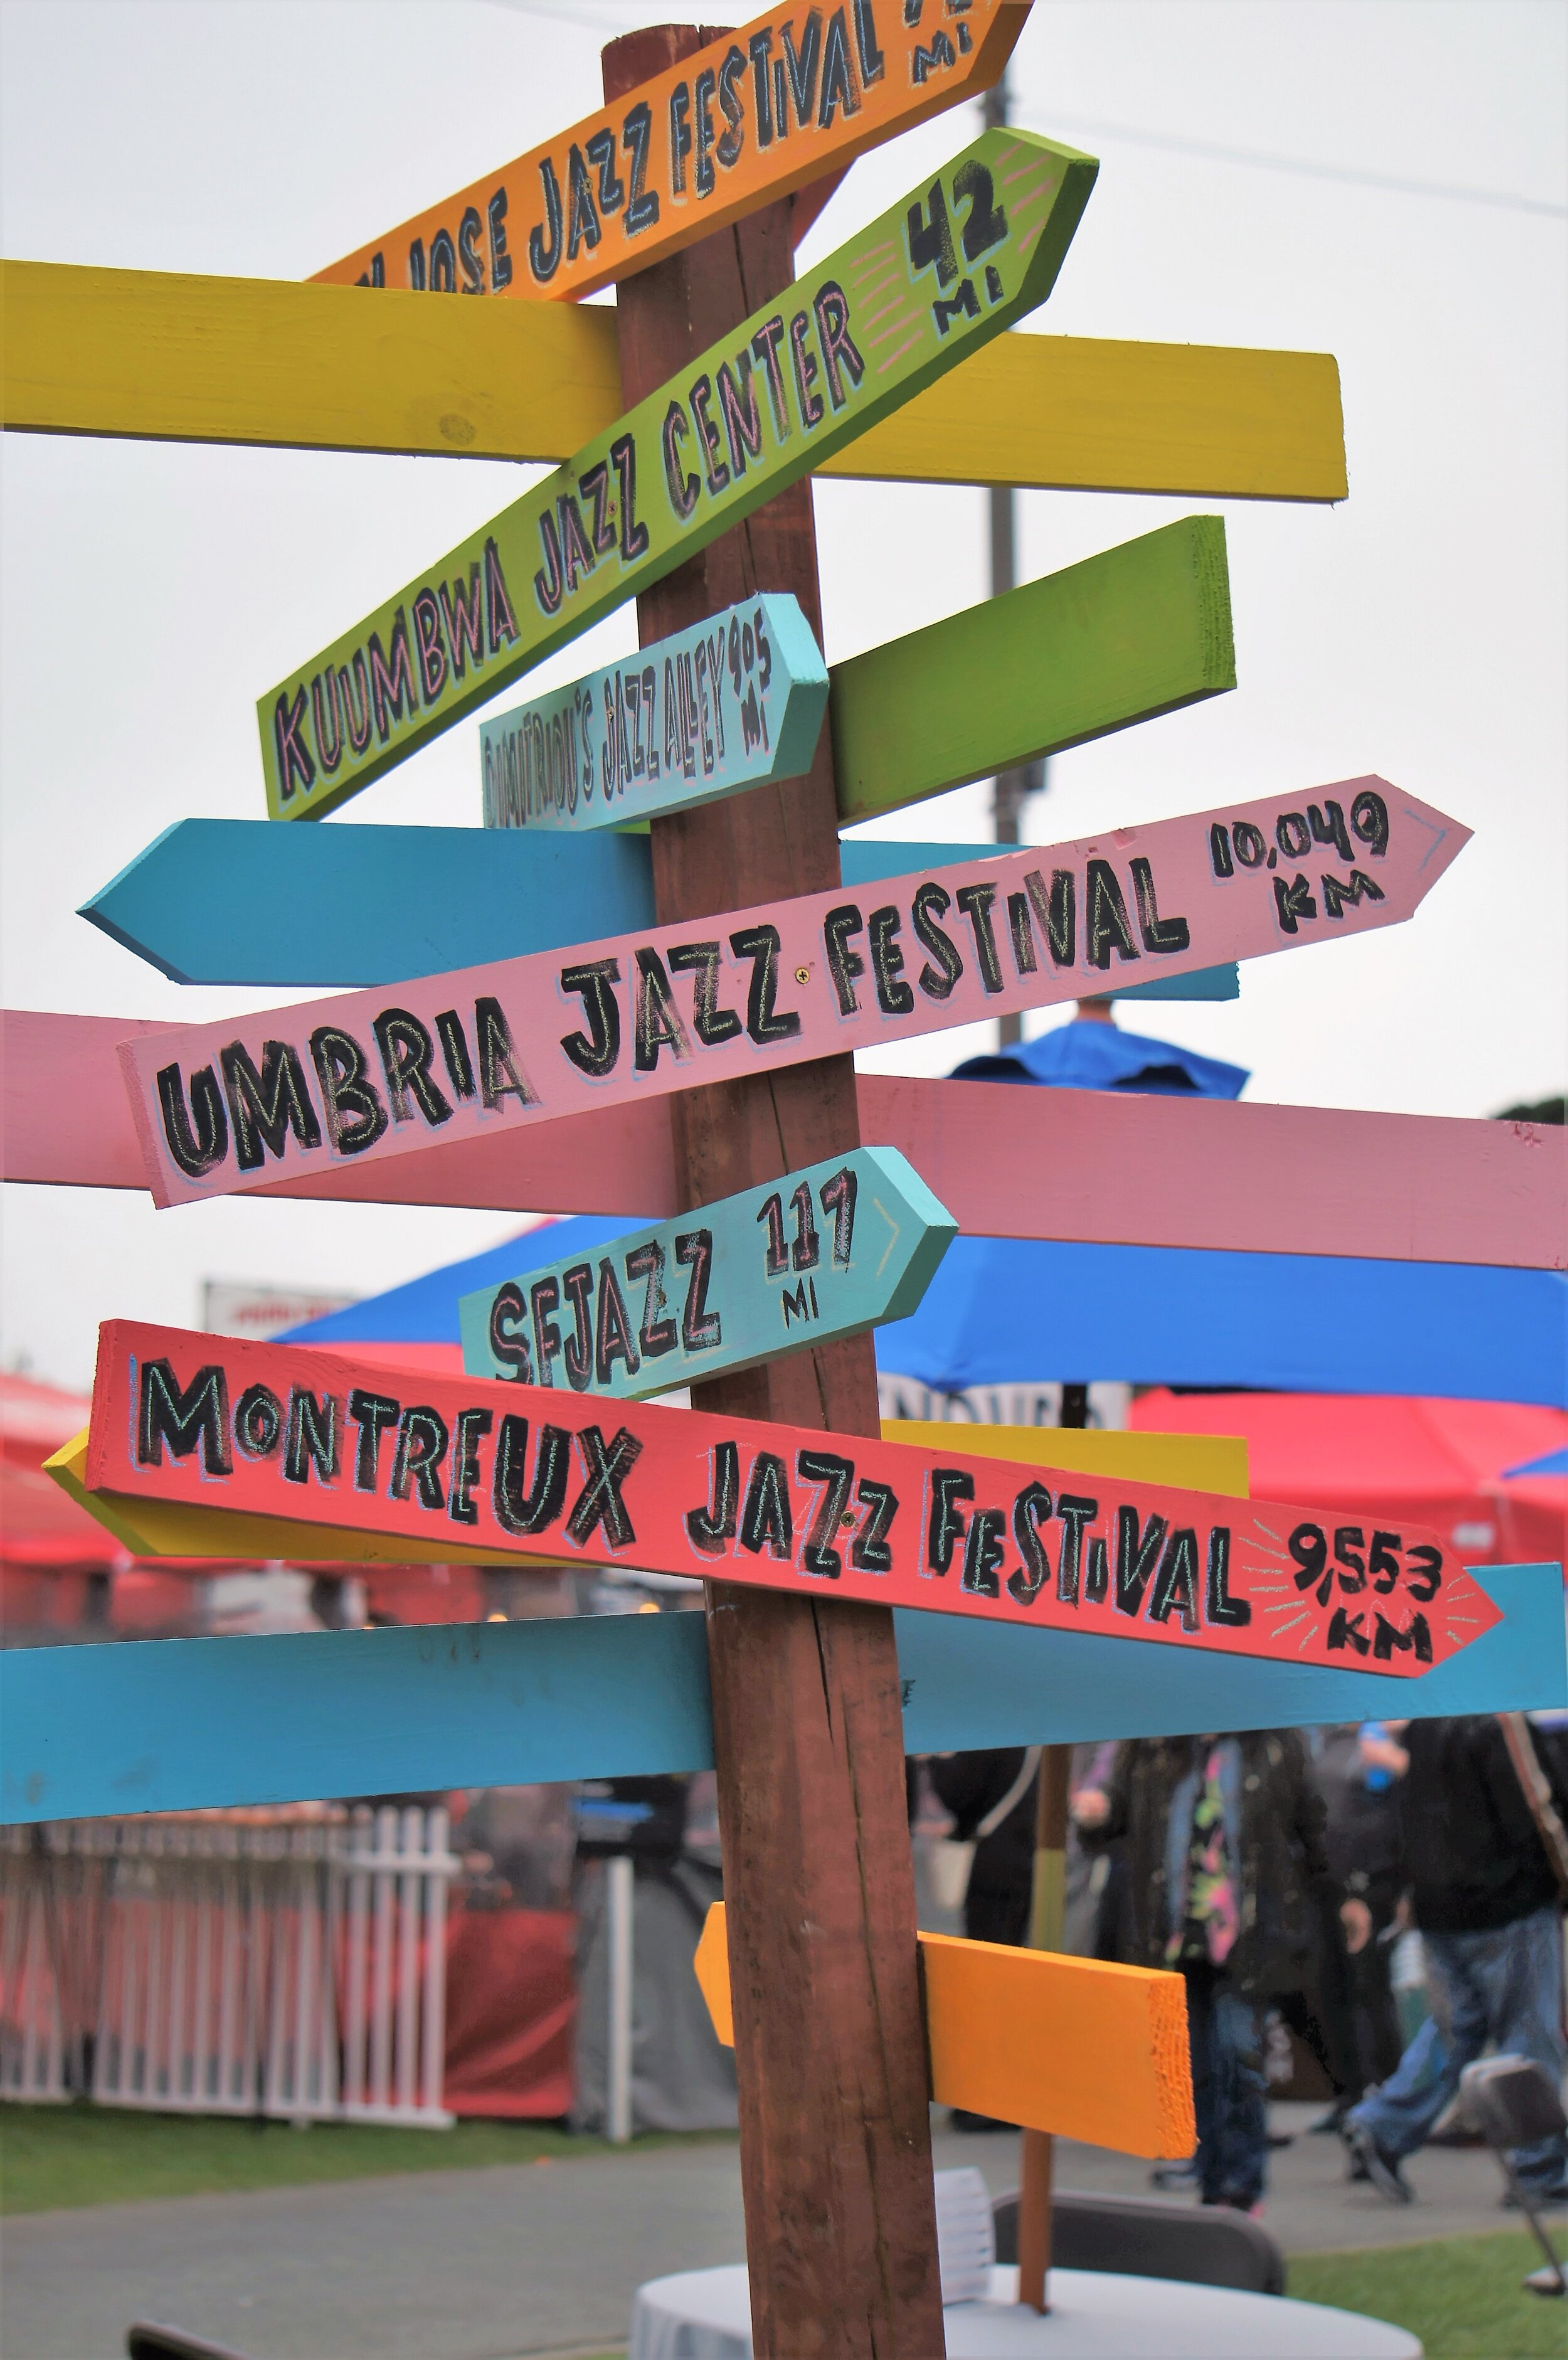 62nd Annual Monterey Jazz Festival